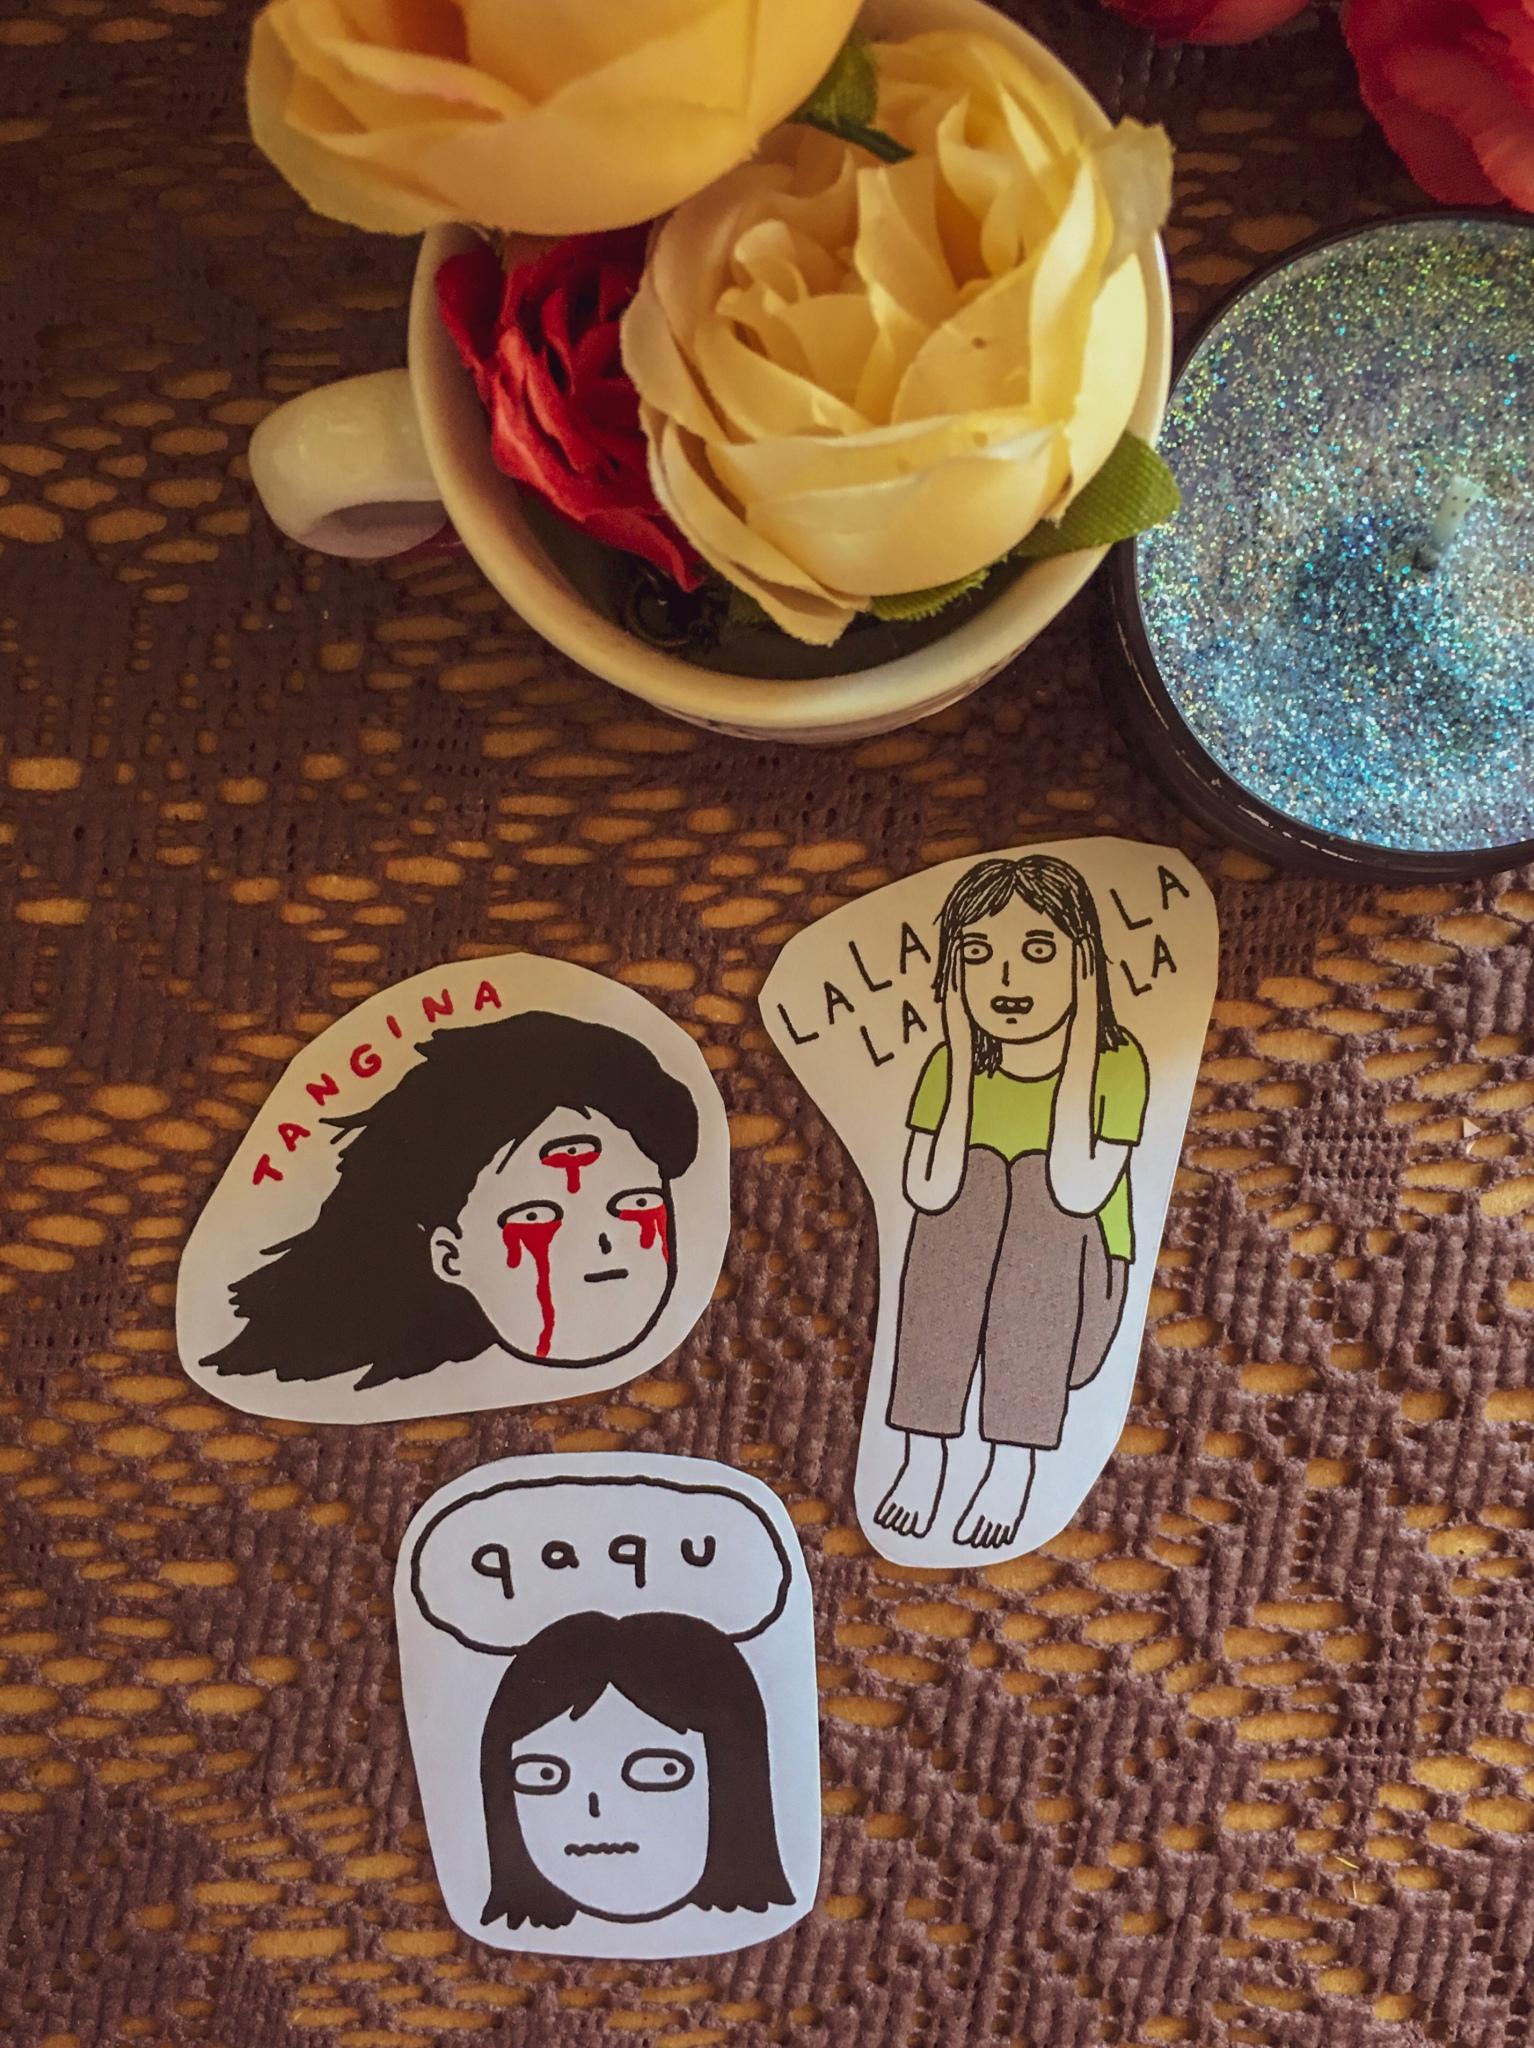 Hulyen UGH stickers